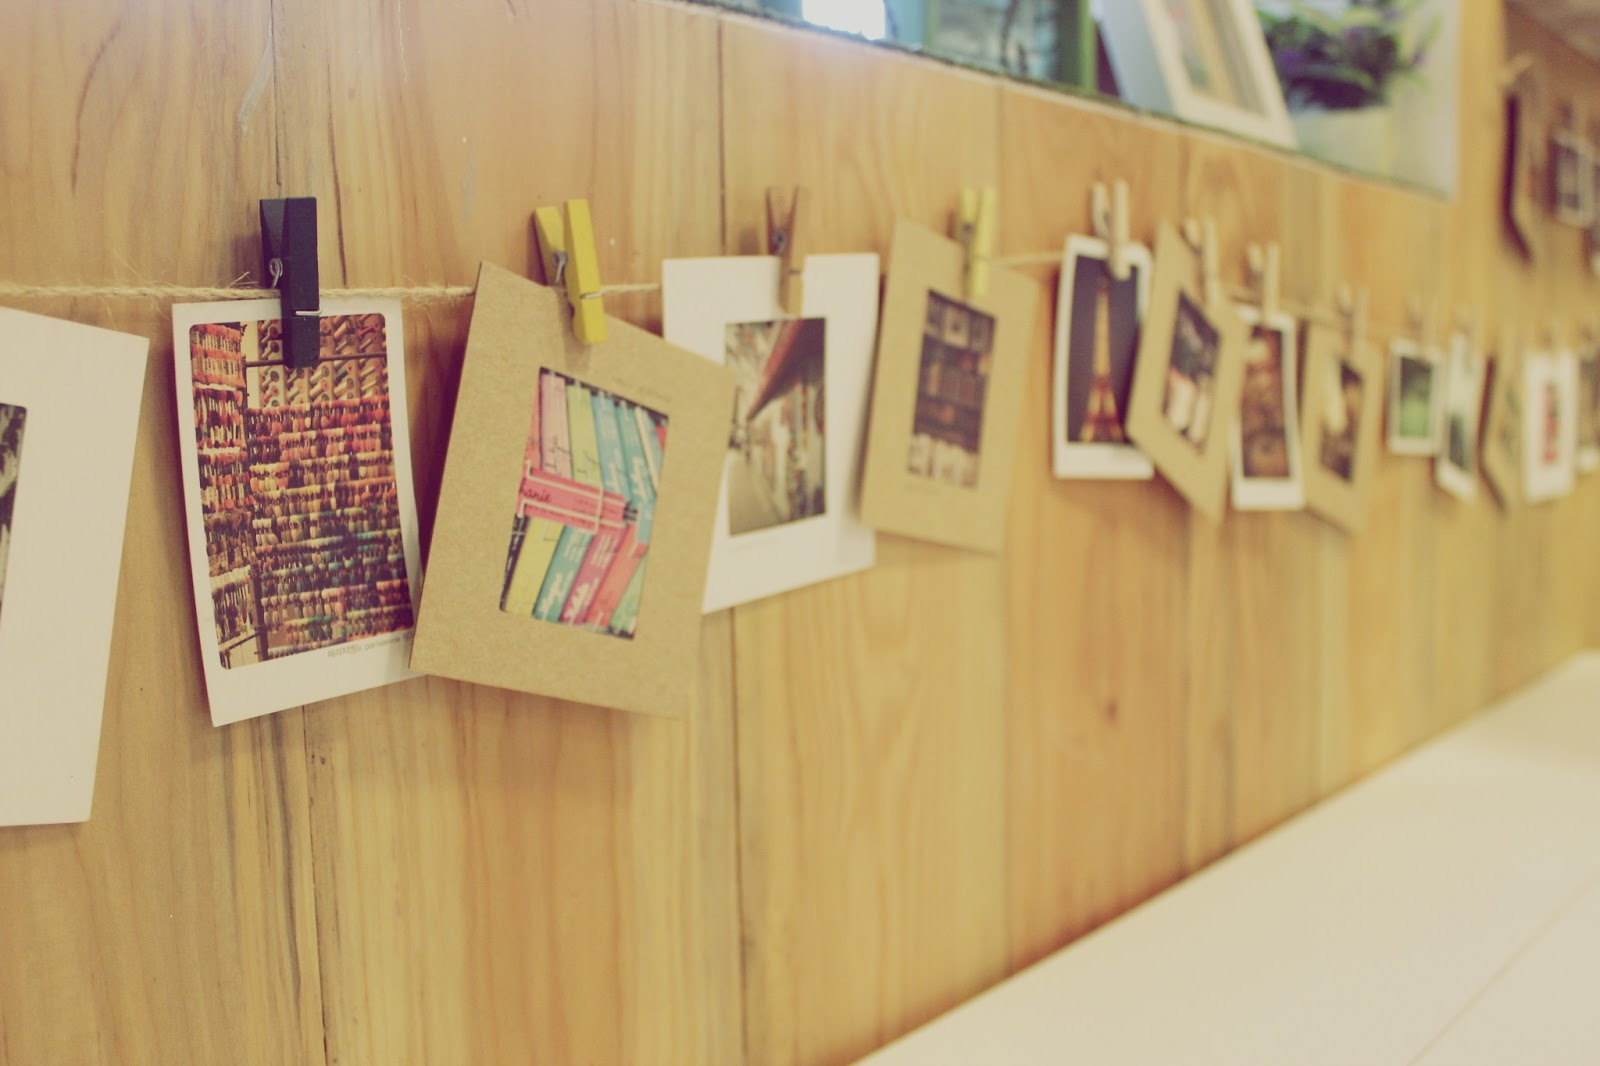 2Story Kitchen, Korean Cafe, Cute Cafe, Noriter, Dumaguete City, Cute photos, cute photographs